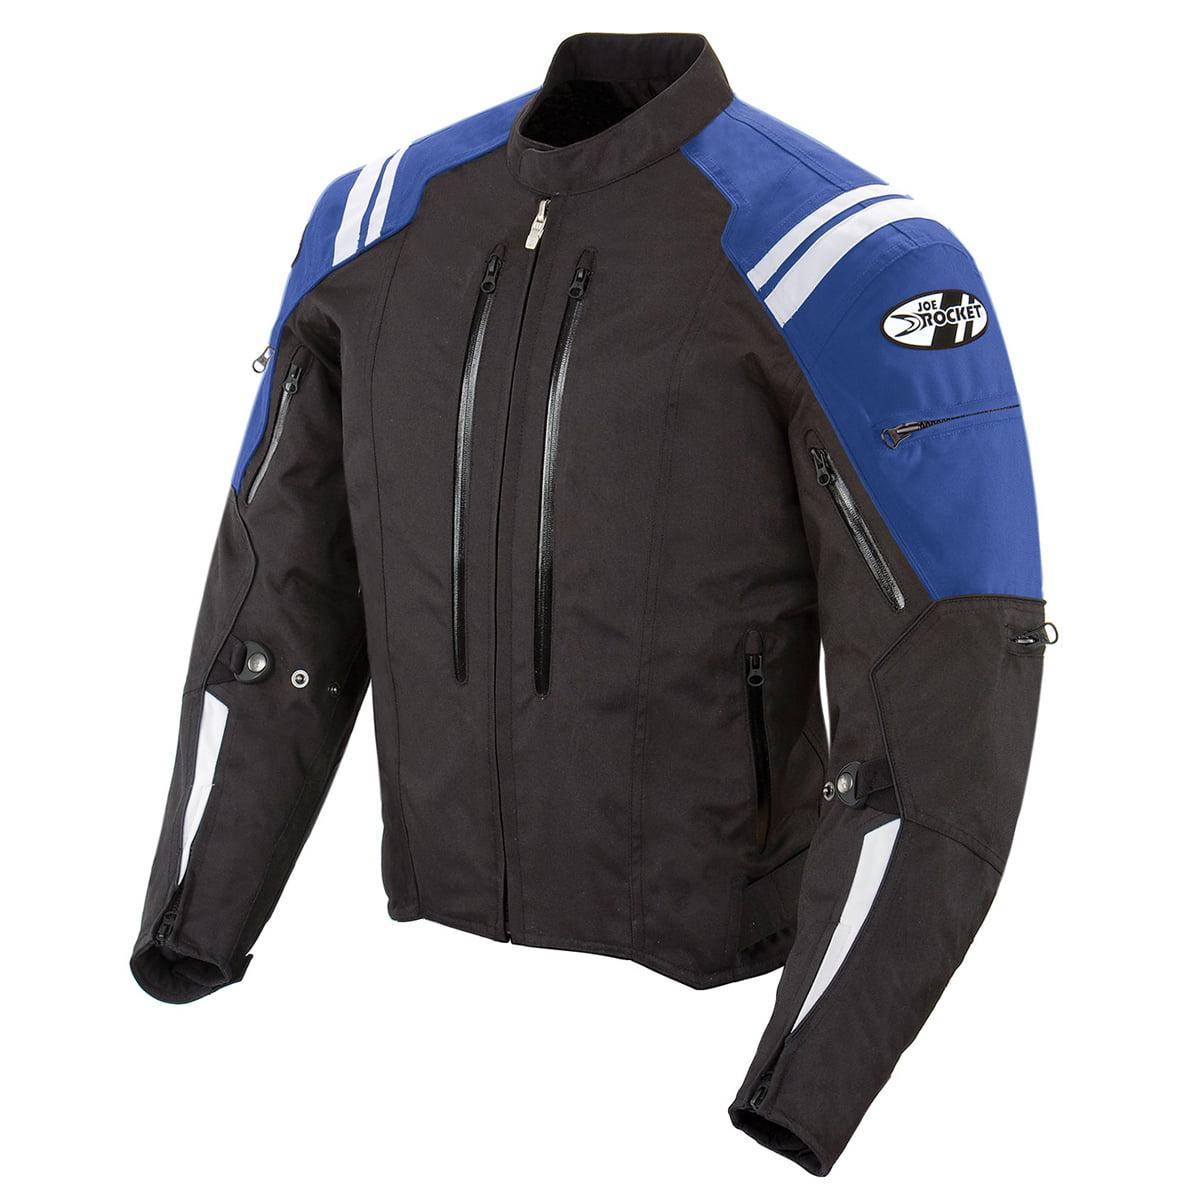 Joe Rocket Atomic 4.0 Mens Black/Blue Textile Motorcycle Jacket